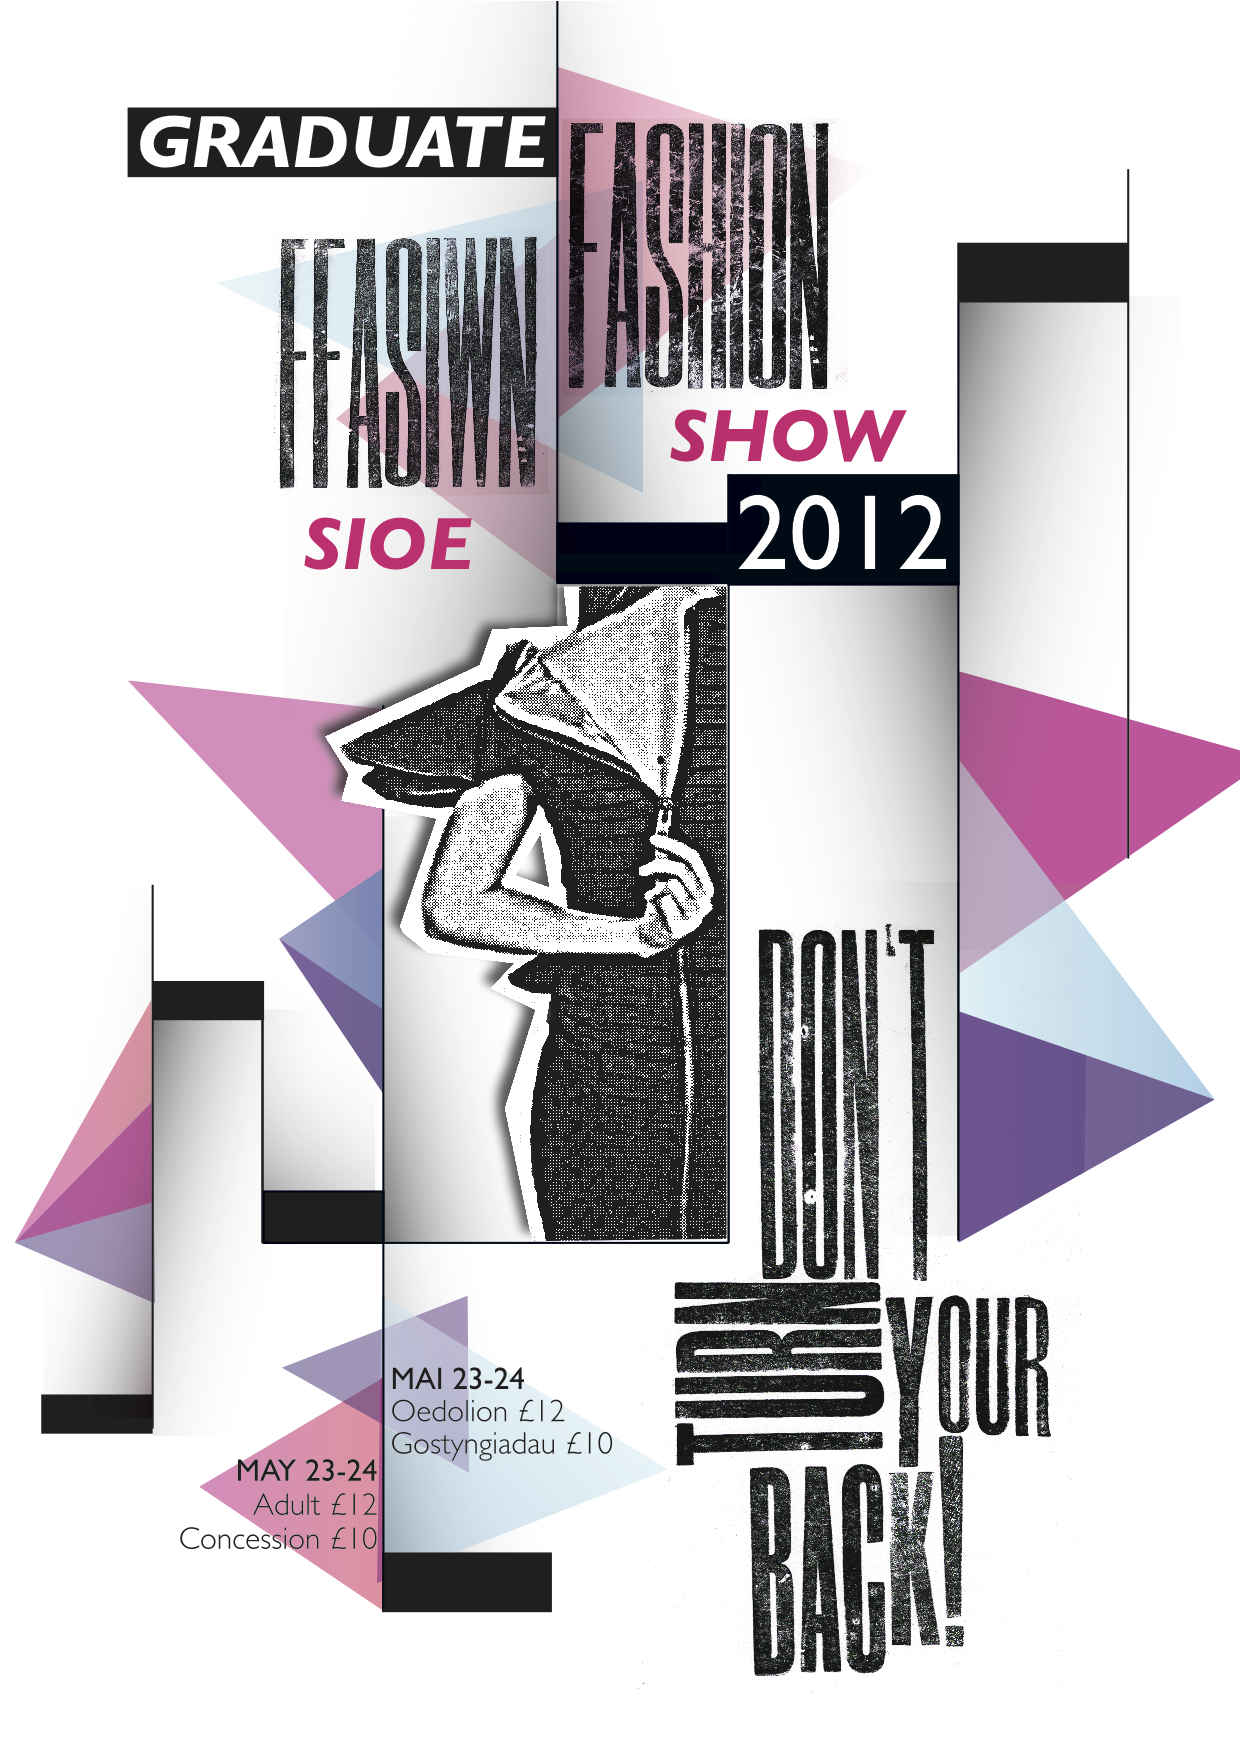 Fashion Poster Design fashion poster design womens high heel – Fashion Poster Design